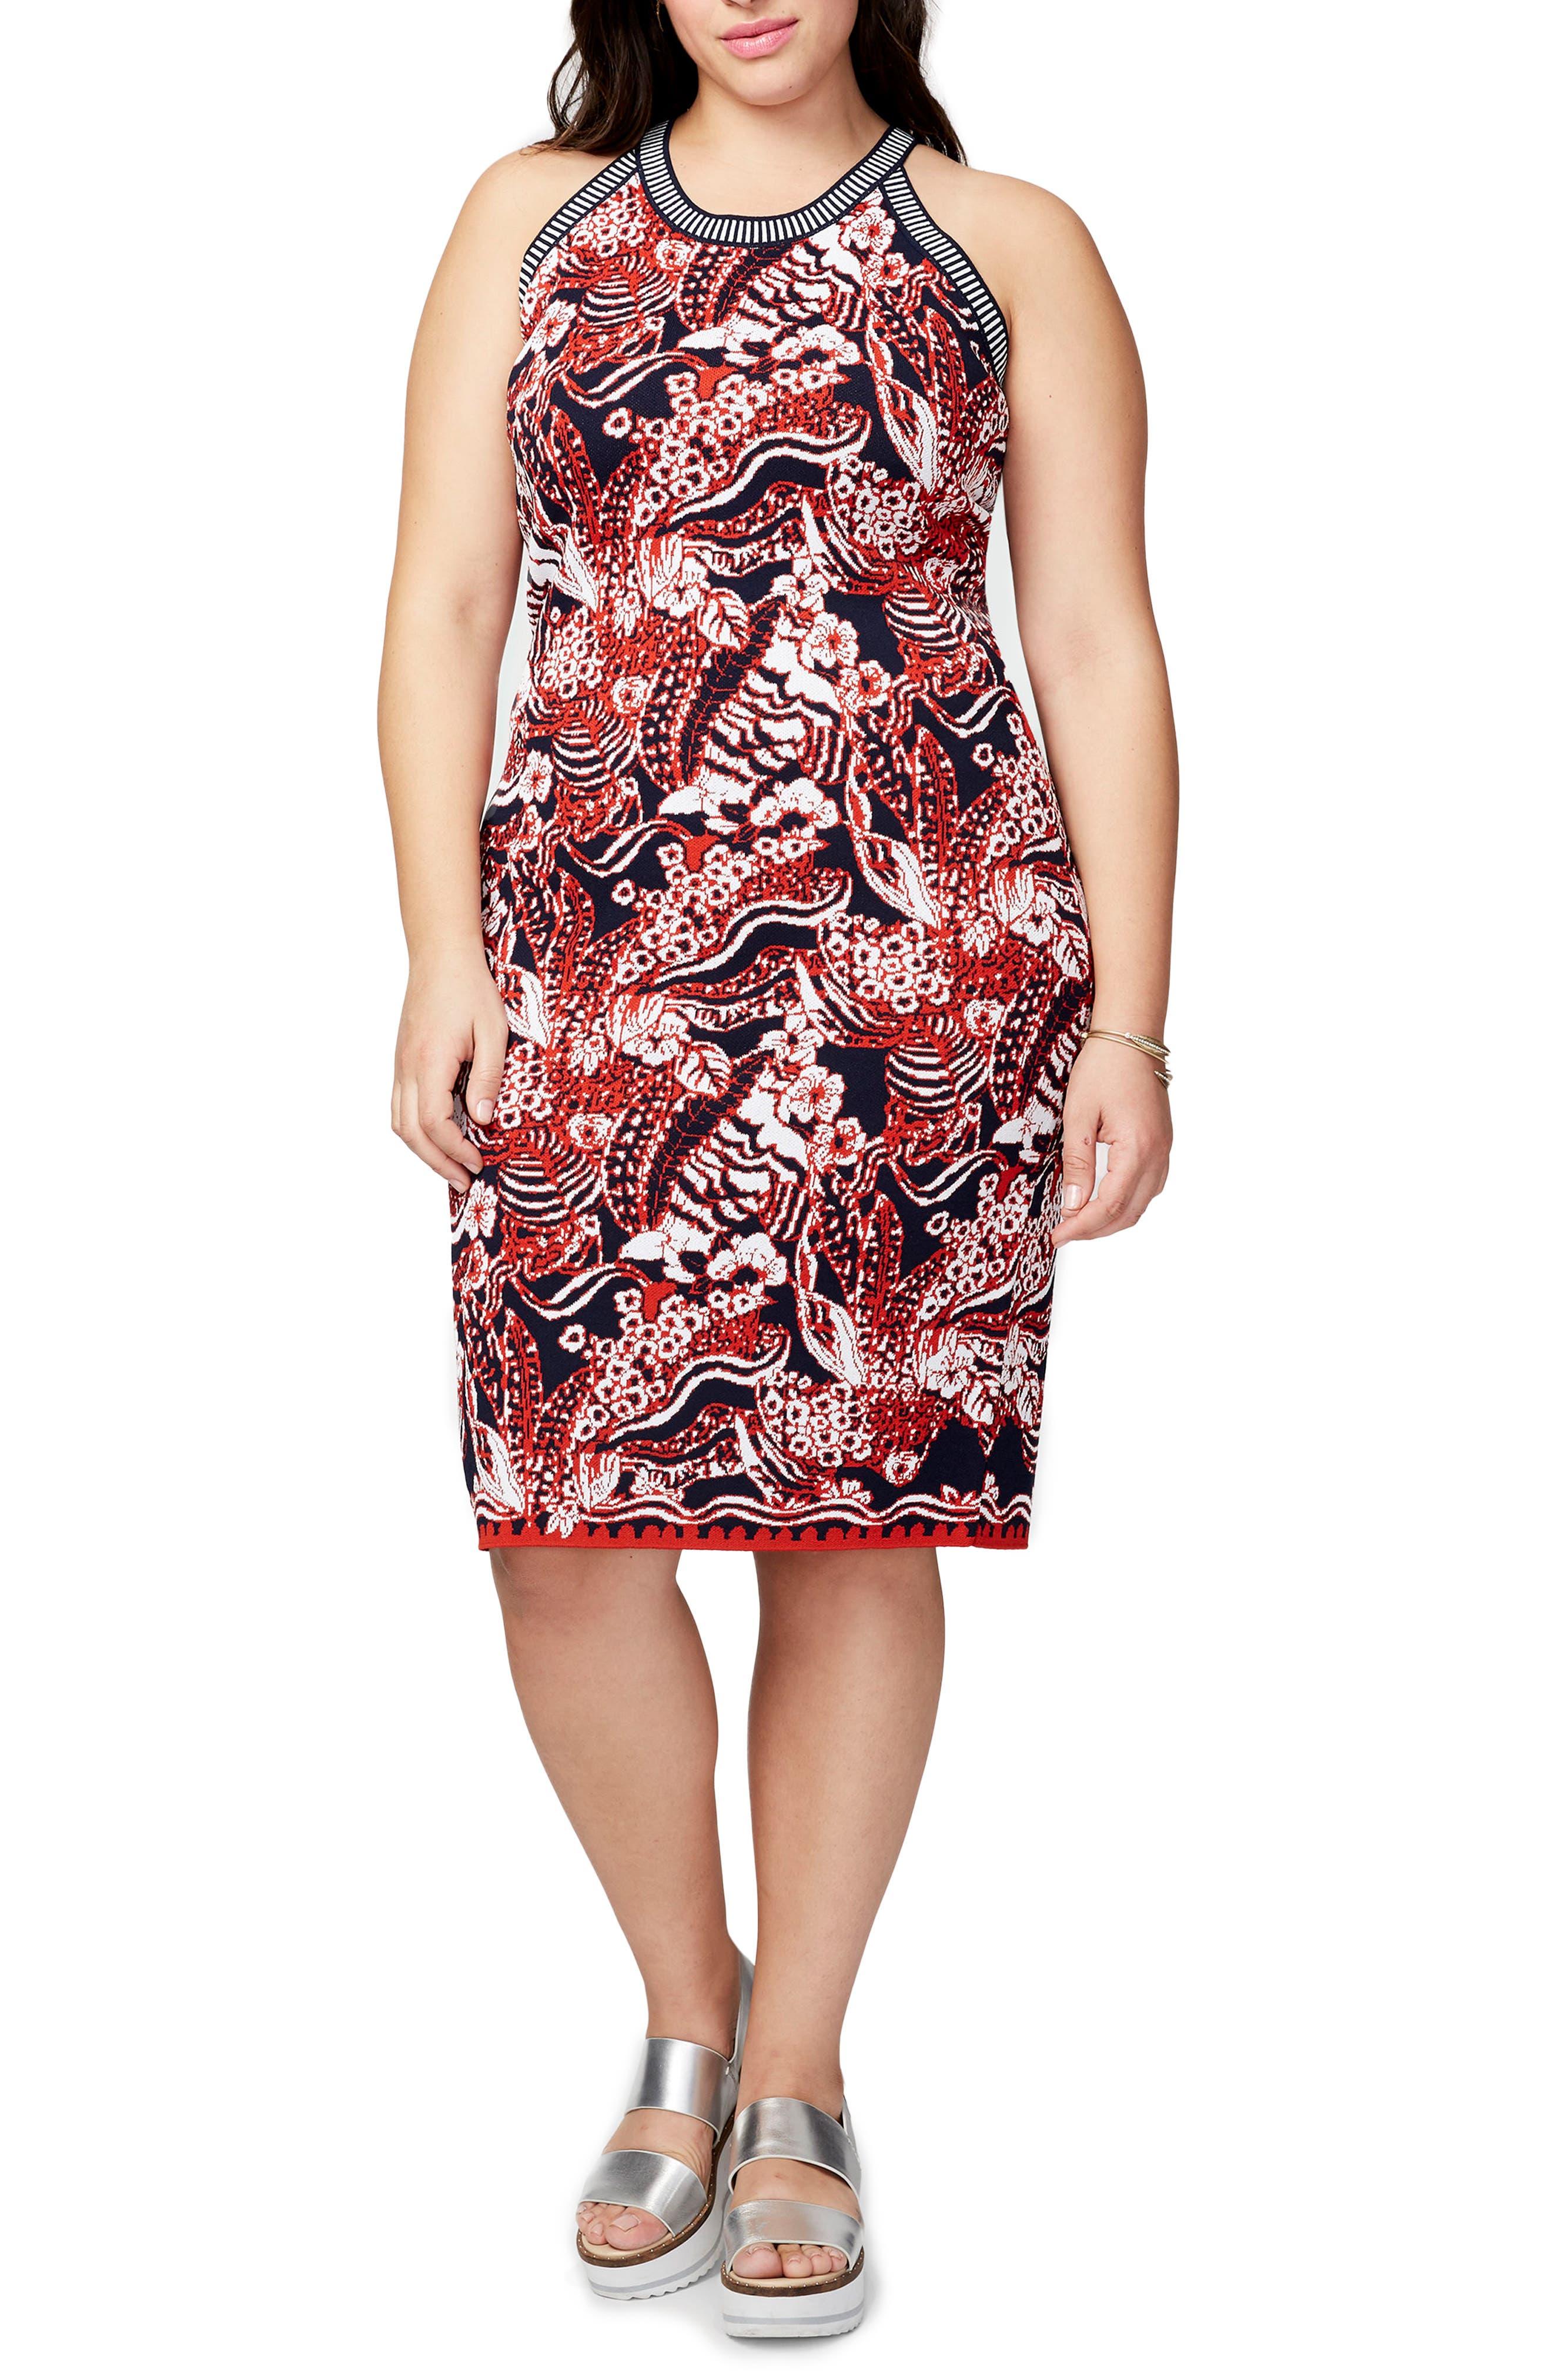 Alternate Image 1 Selected - RACHEL Rachel Roy Floral Jacquard Halter Neck Sweater Dress (Plus Size)